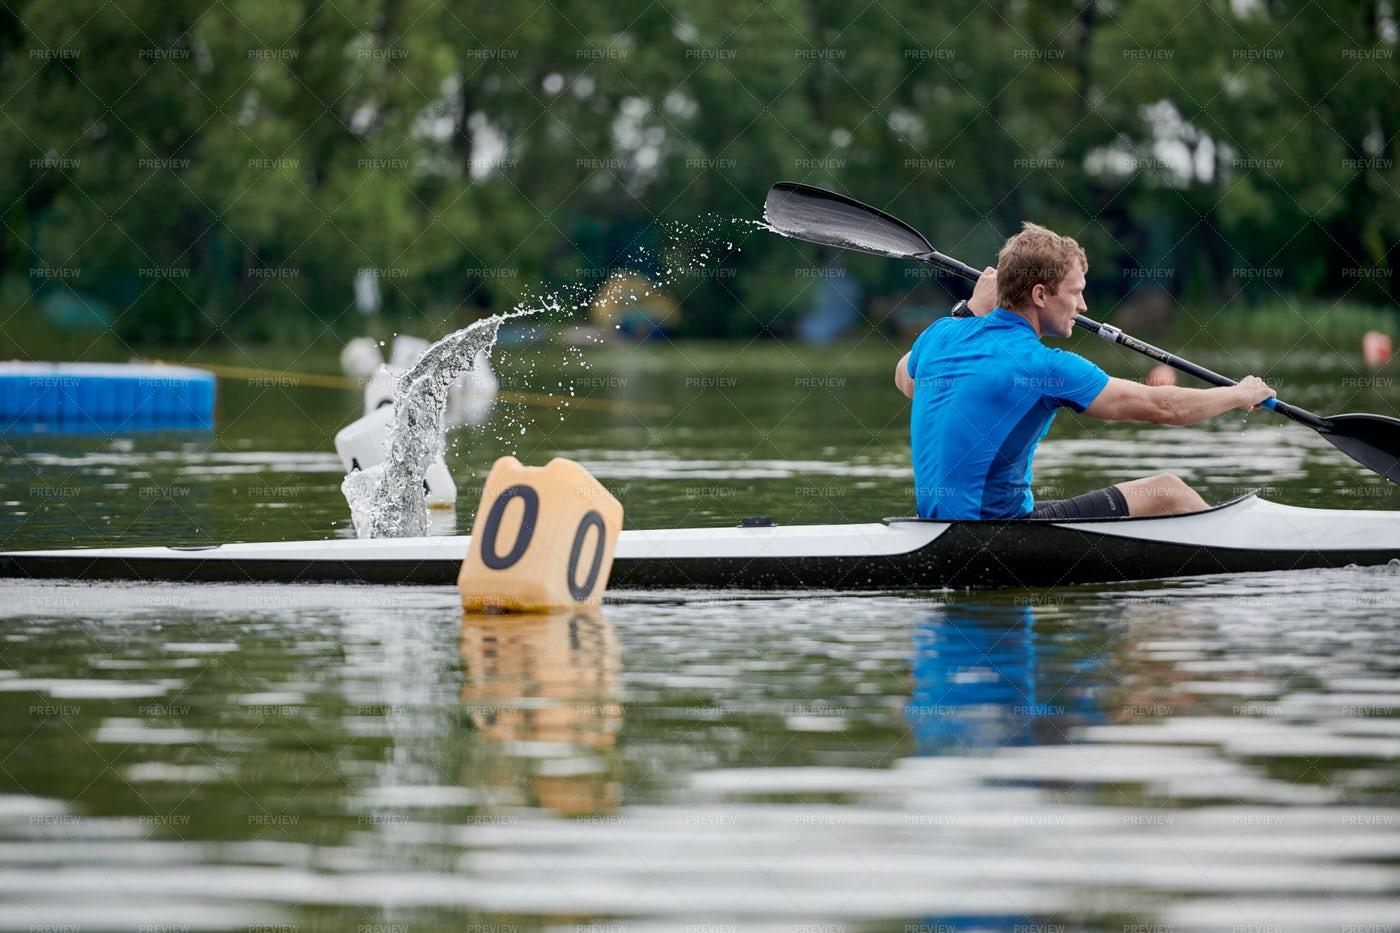 Man Rowing On The Lake: Stock Photos